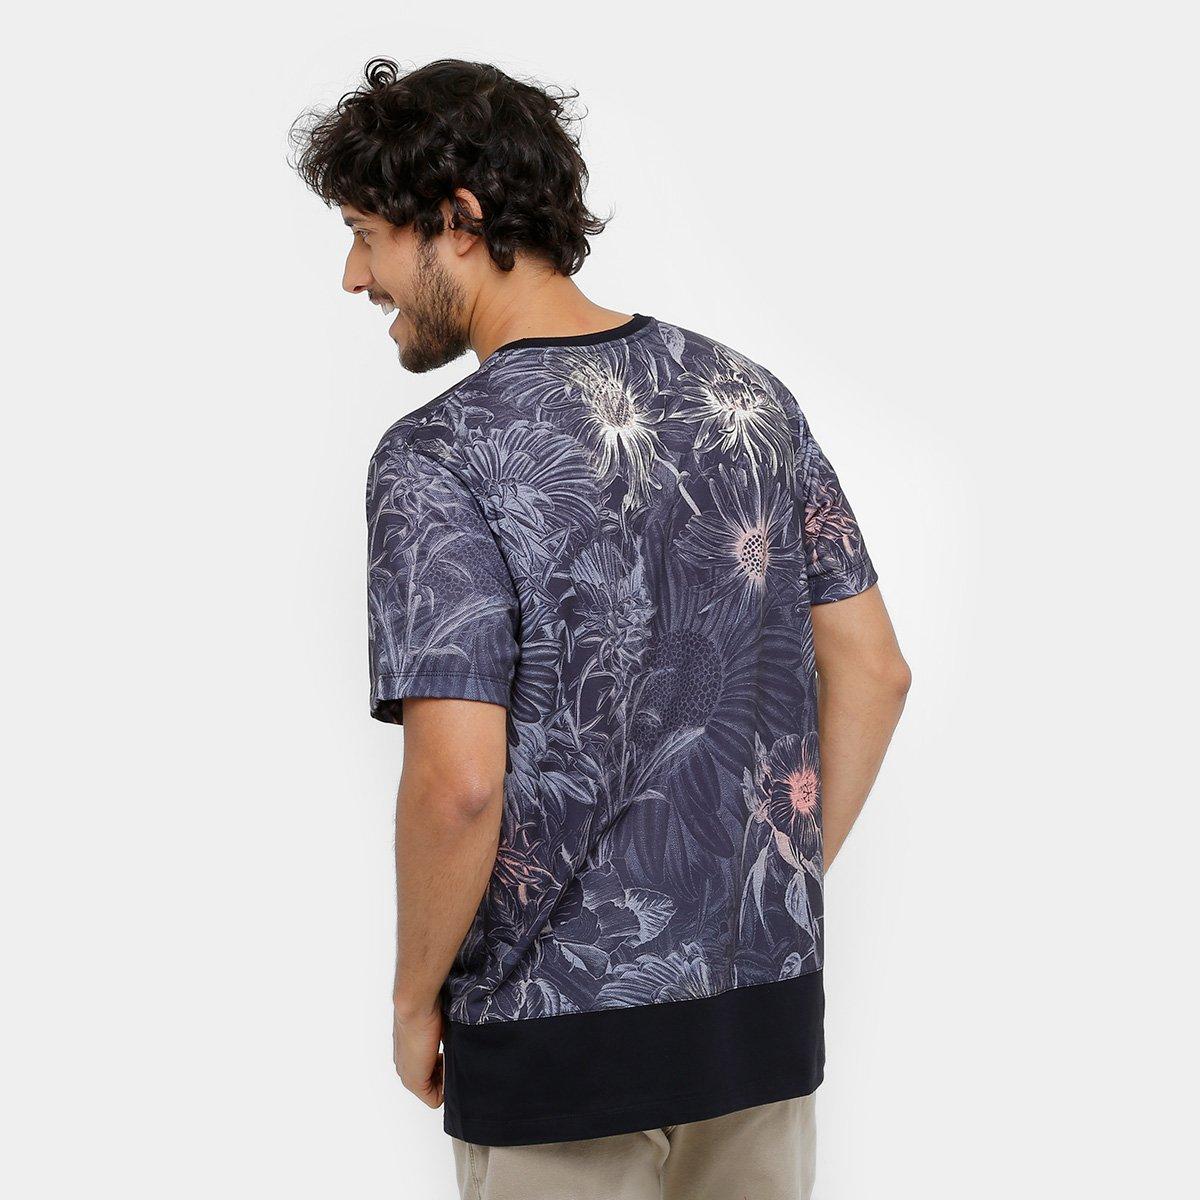 b8f4cc708b911 Camiseta MCD Especial Ghost Garden Masculina